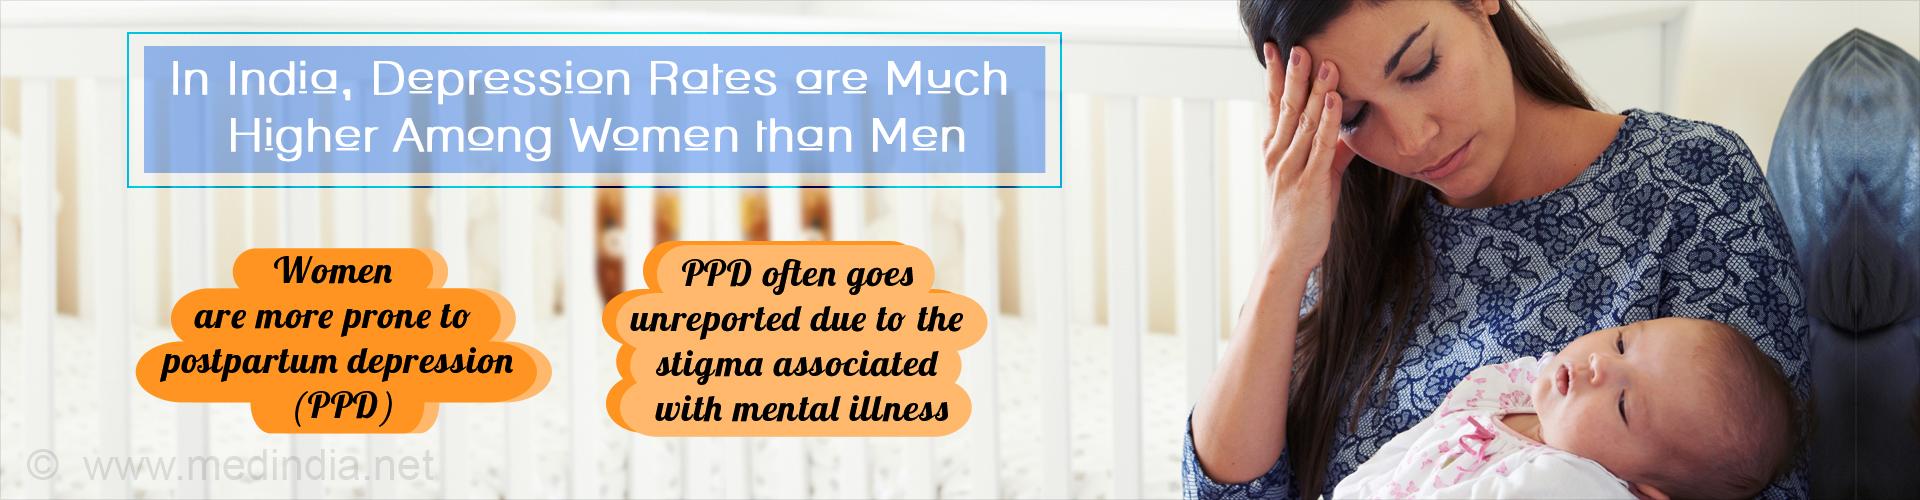 Postpartum Depression- A Major Concern Among Indian Women